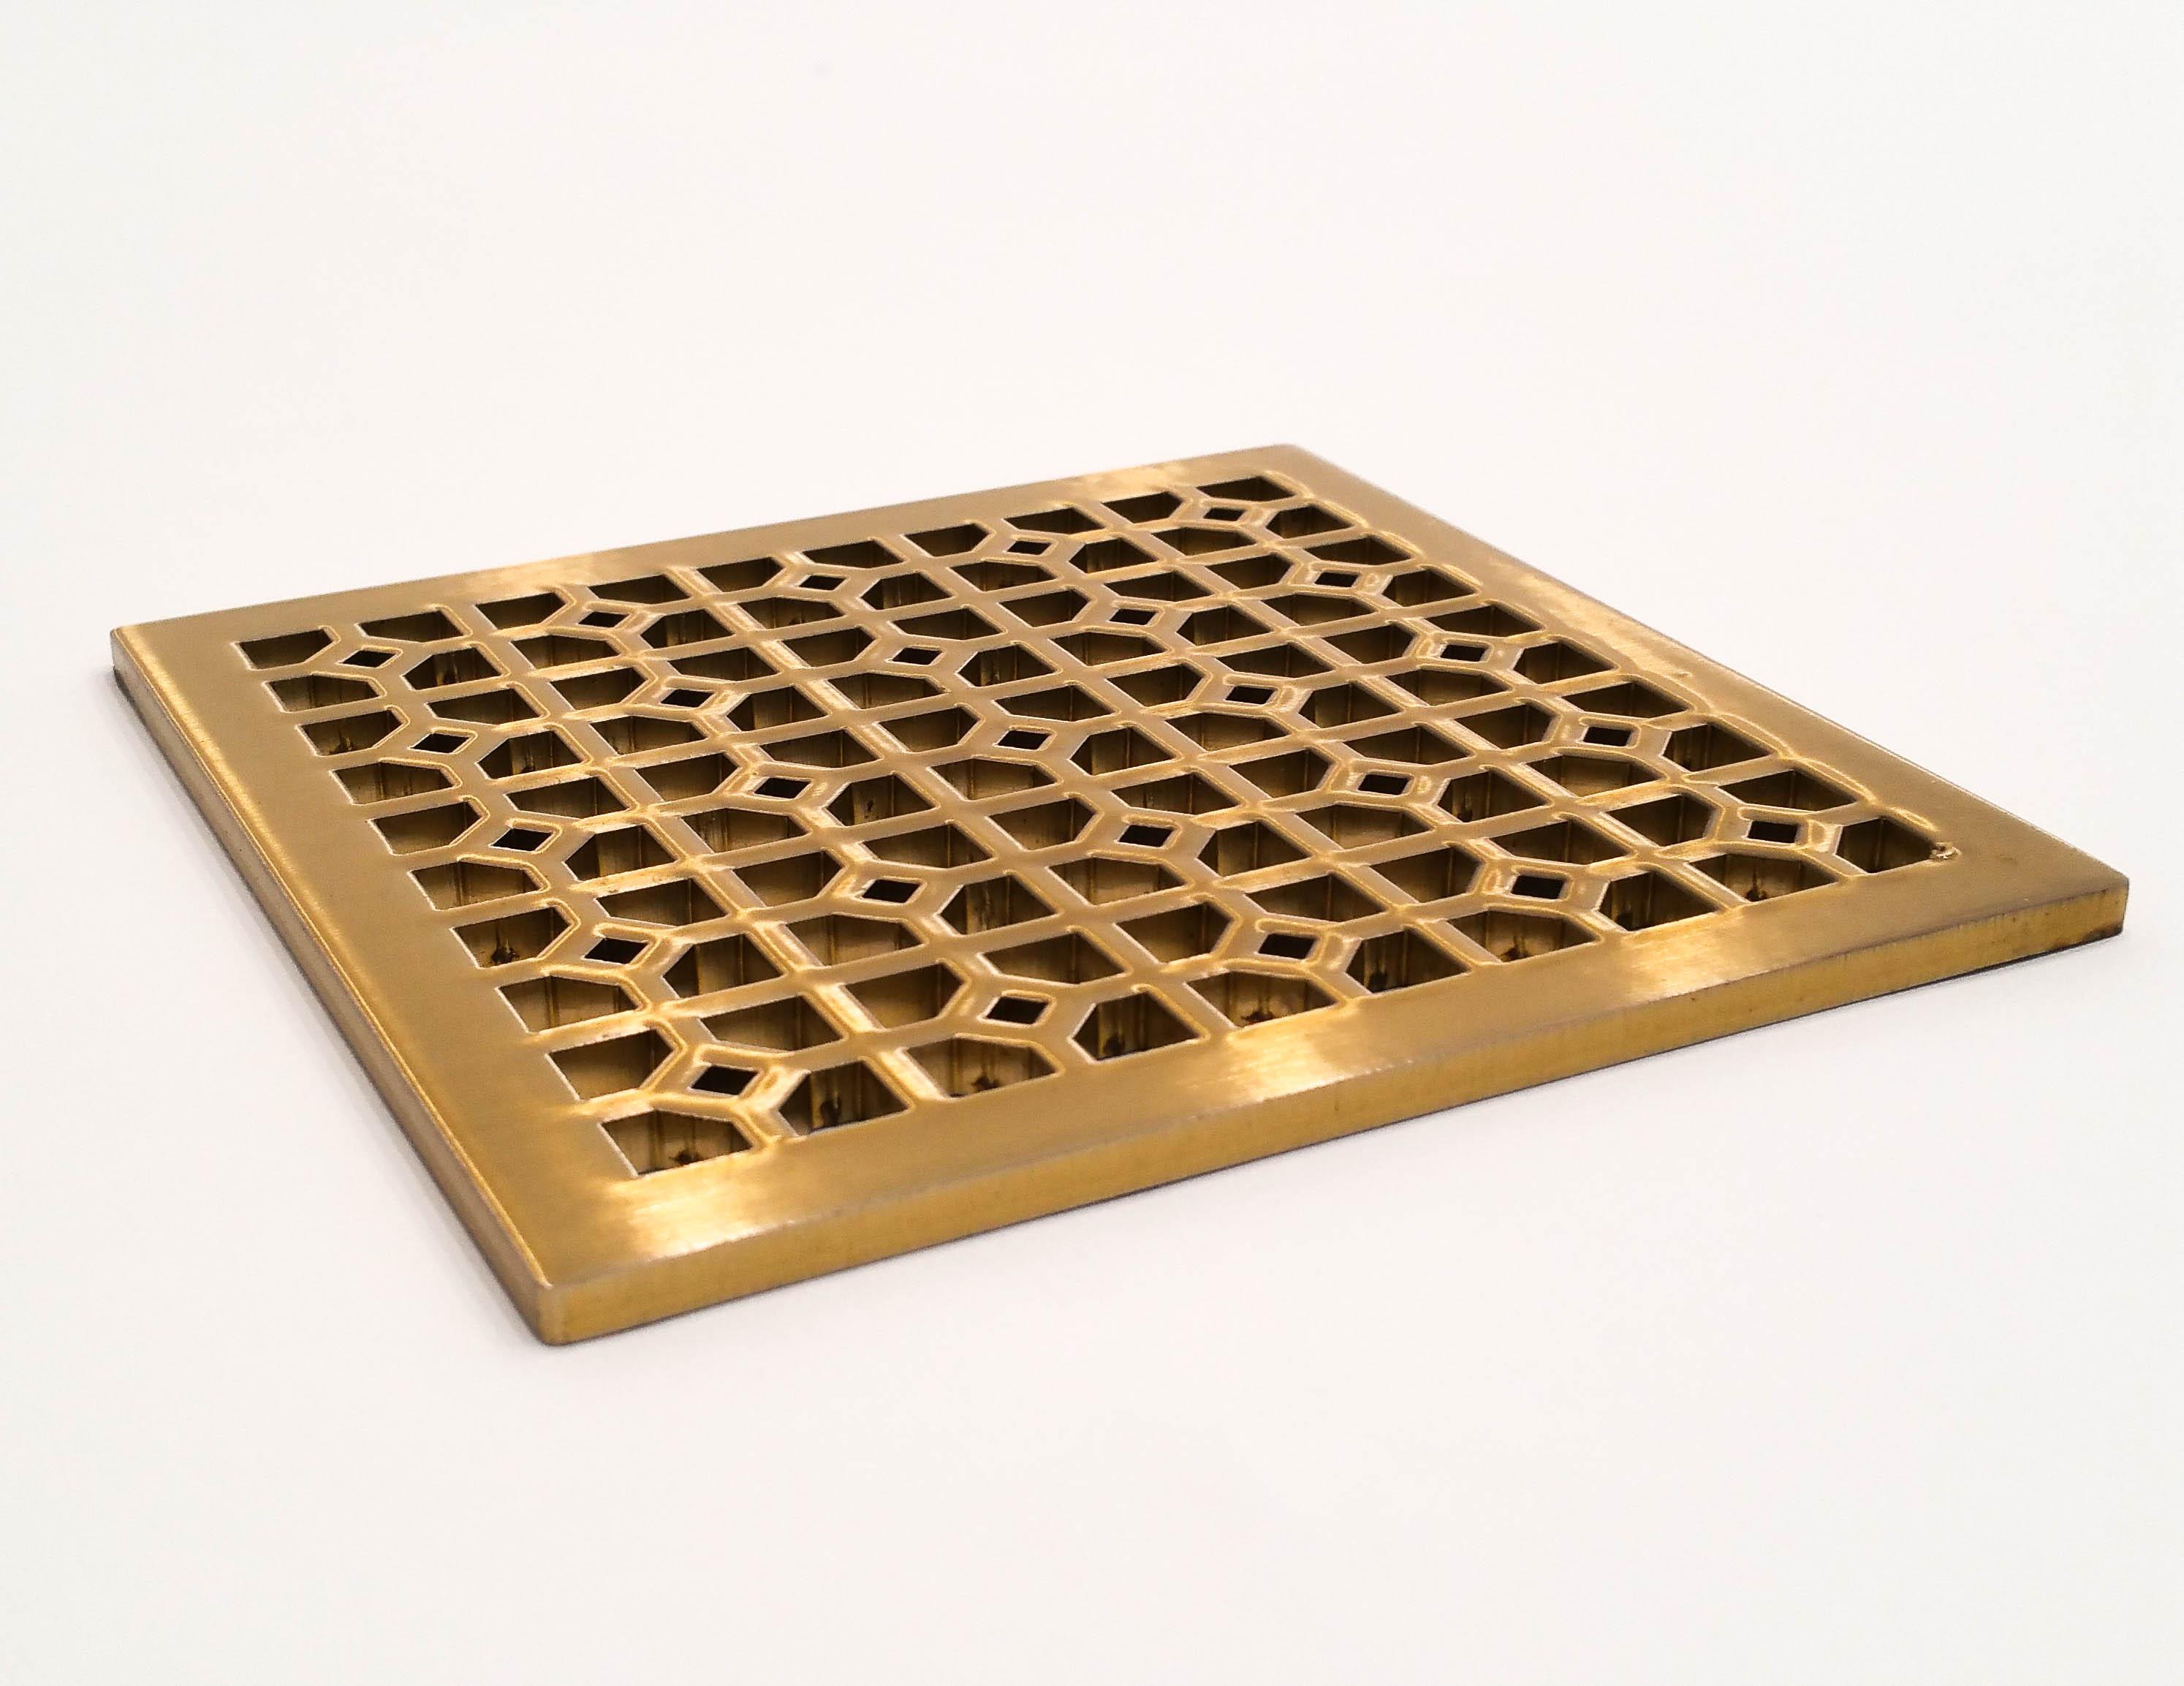 Infinity Drain in satin bronze finish